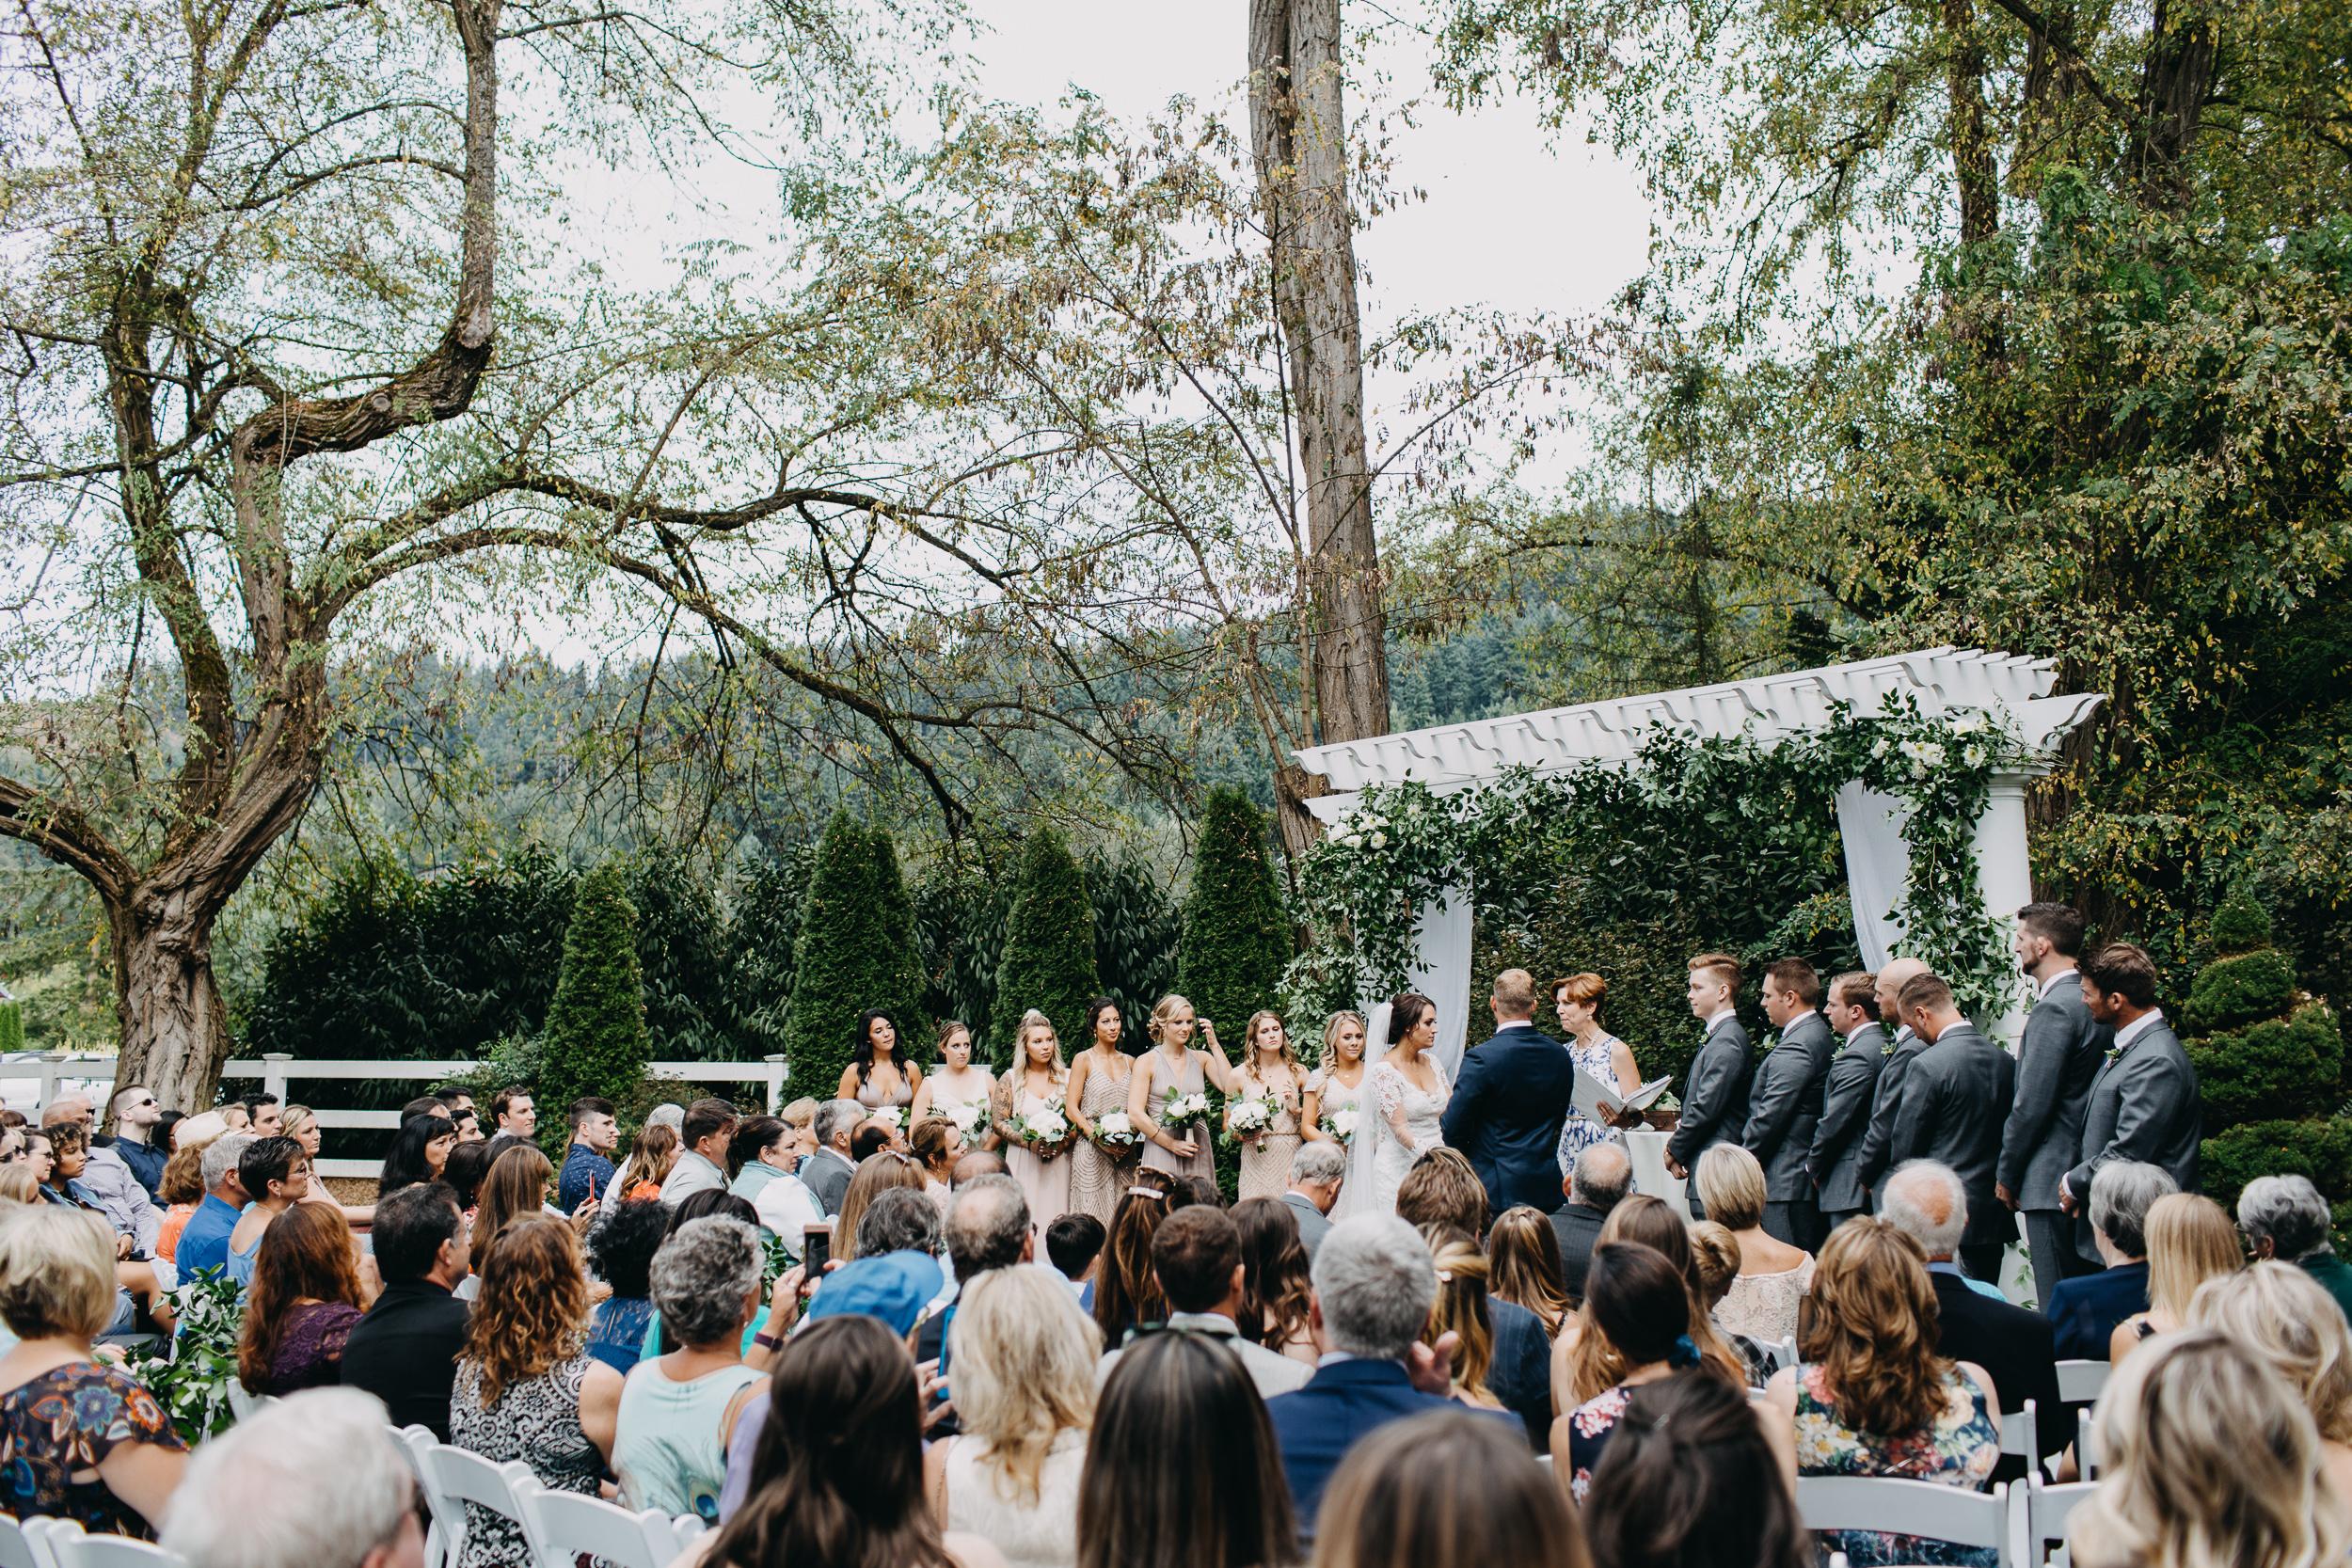 20170820 Savanna & Vince Wedding 1182.jpg